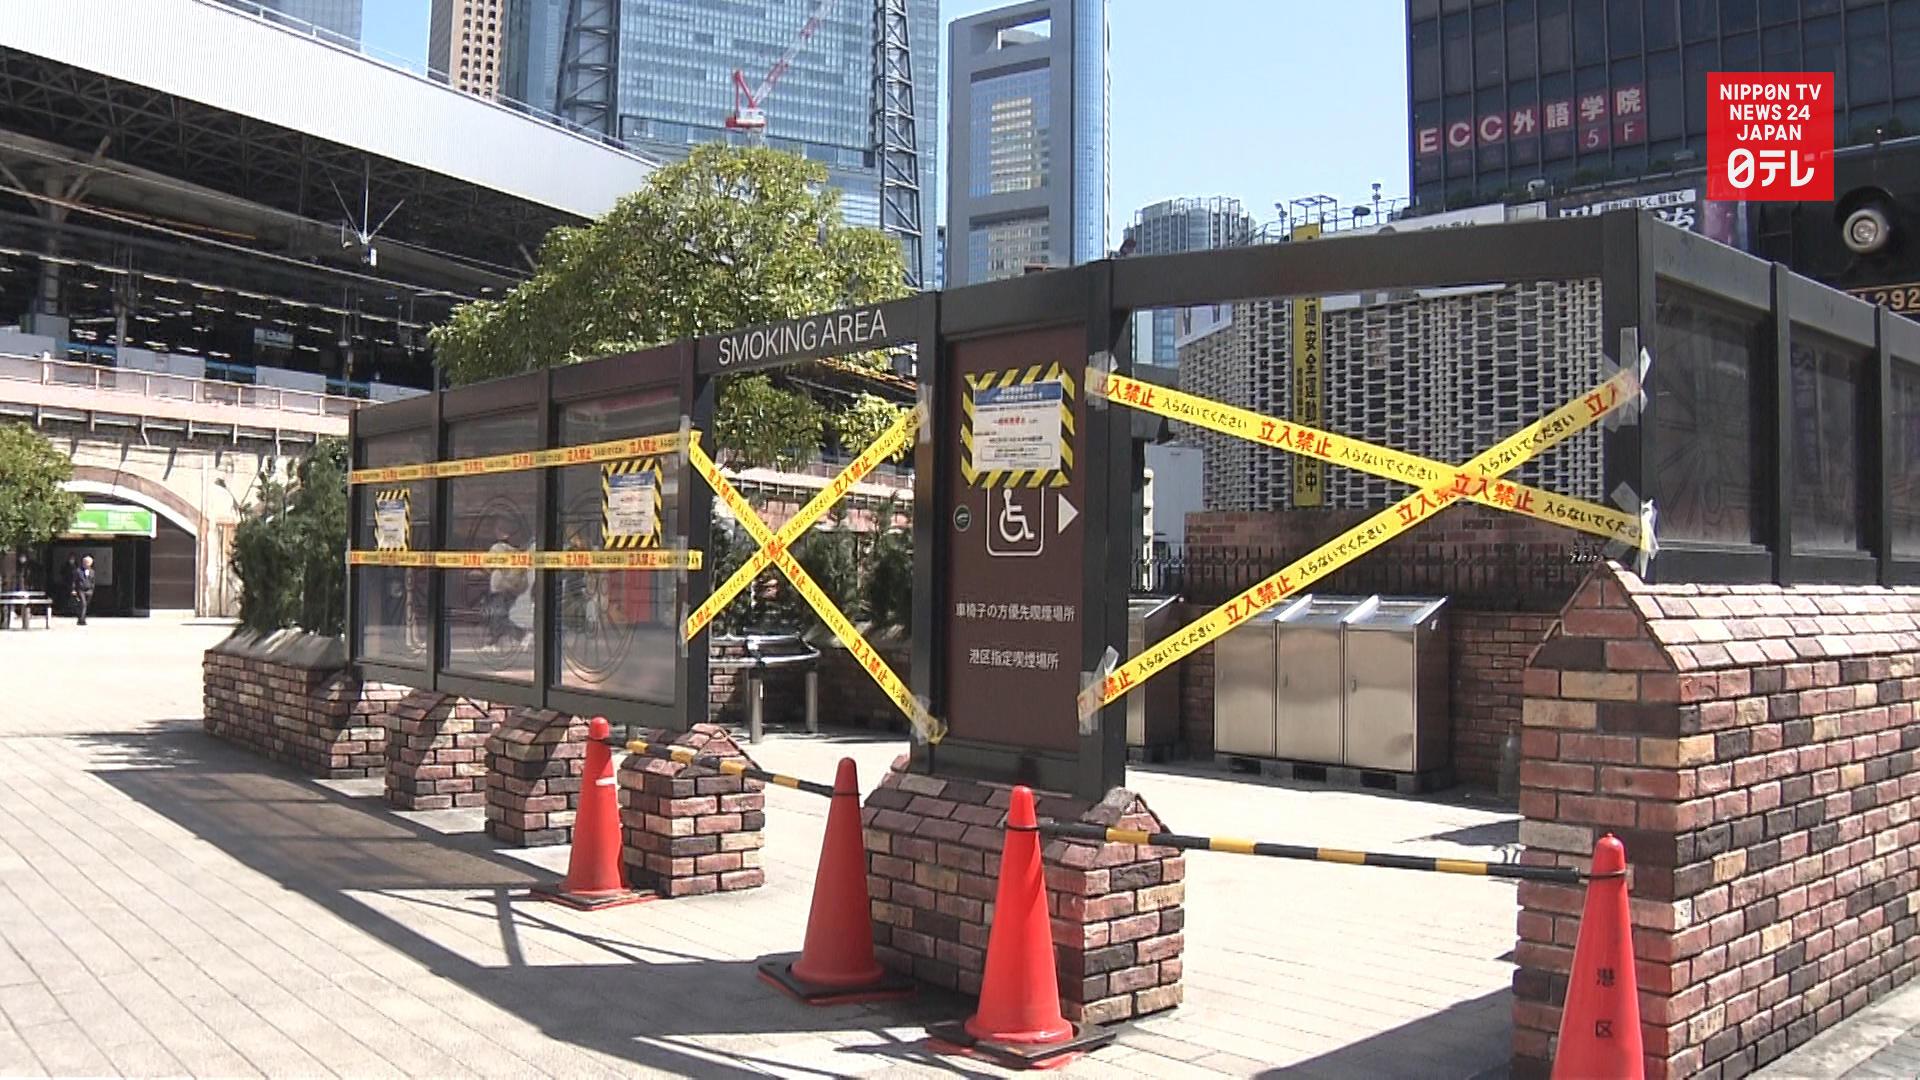 Tokyo's Minato Ward closes smoking areas